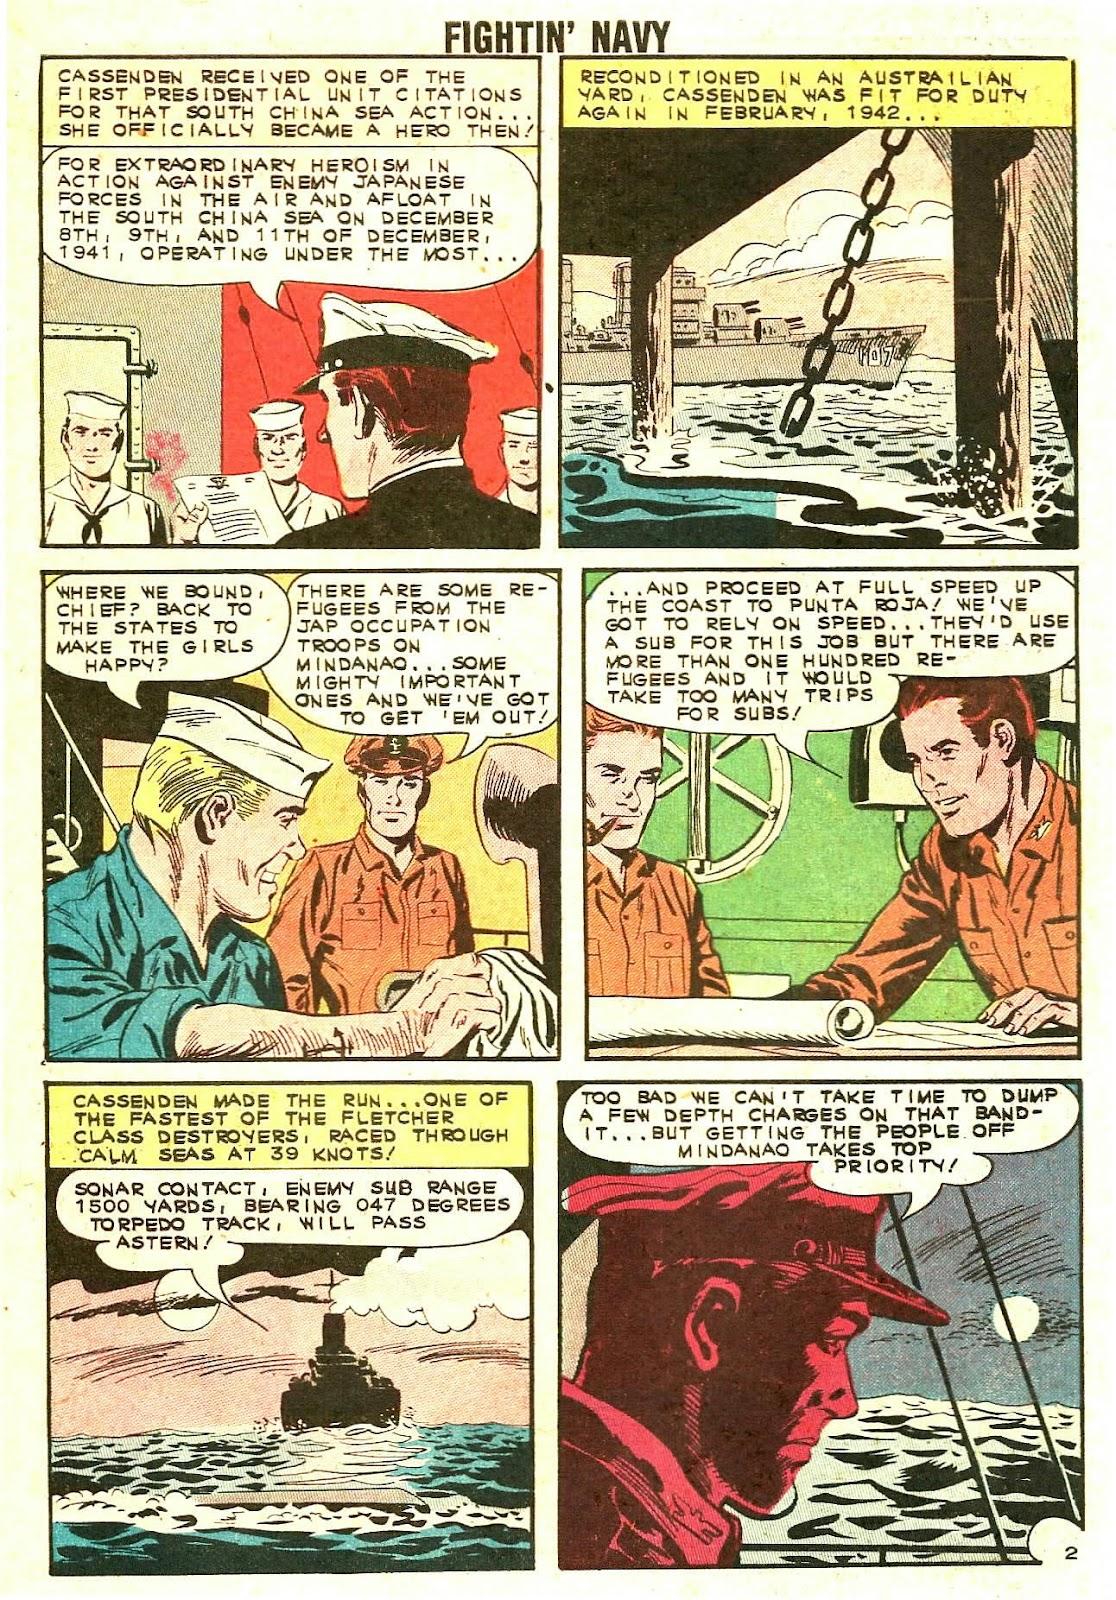 Read online Fightin' Navy comic -  Issue #110 - 10